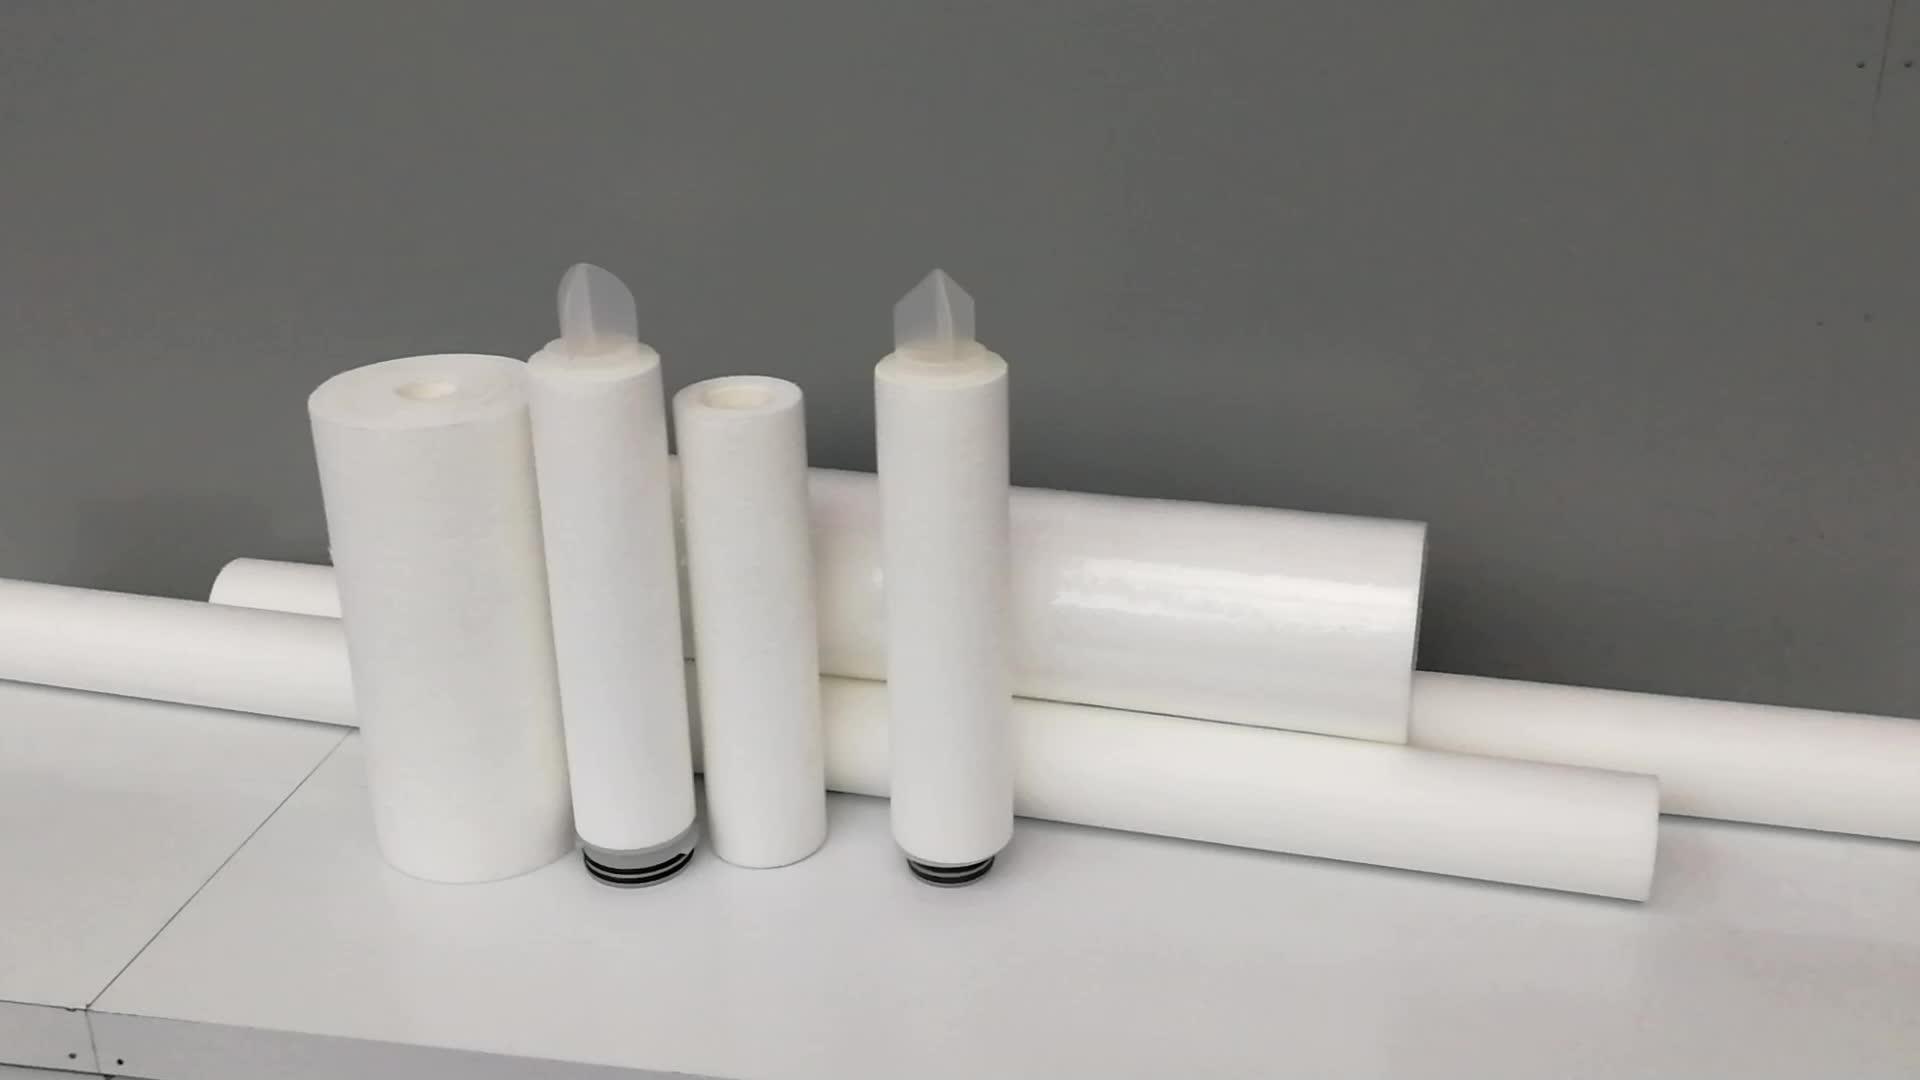 Polipropilen tortu derinlik için eleman filtre filtre kartuşu